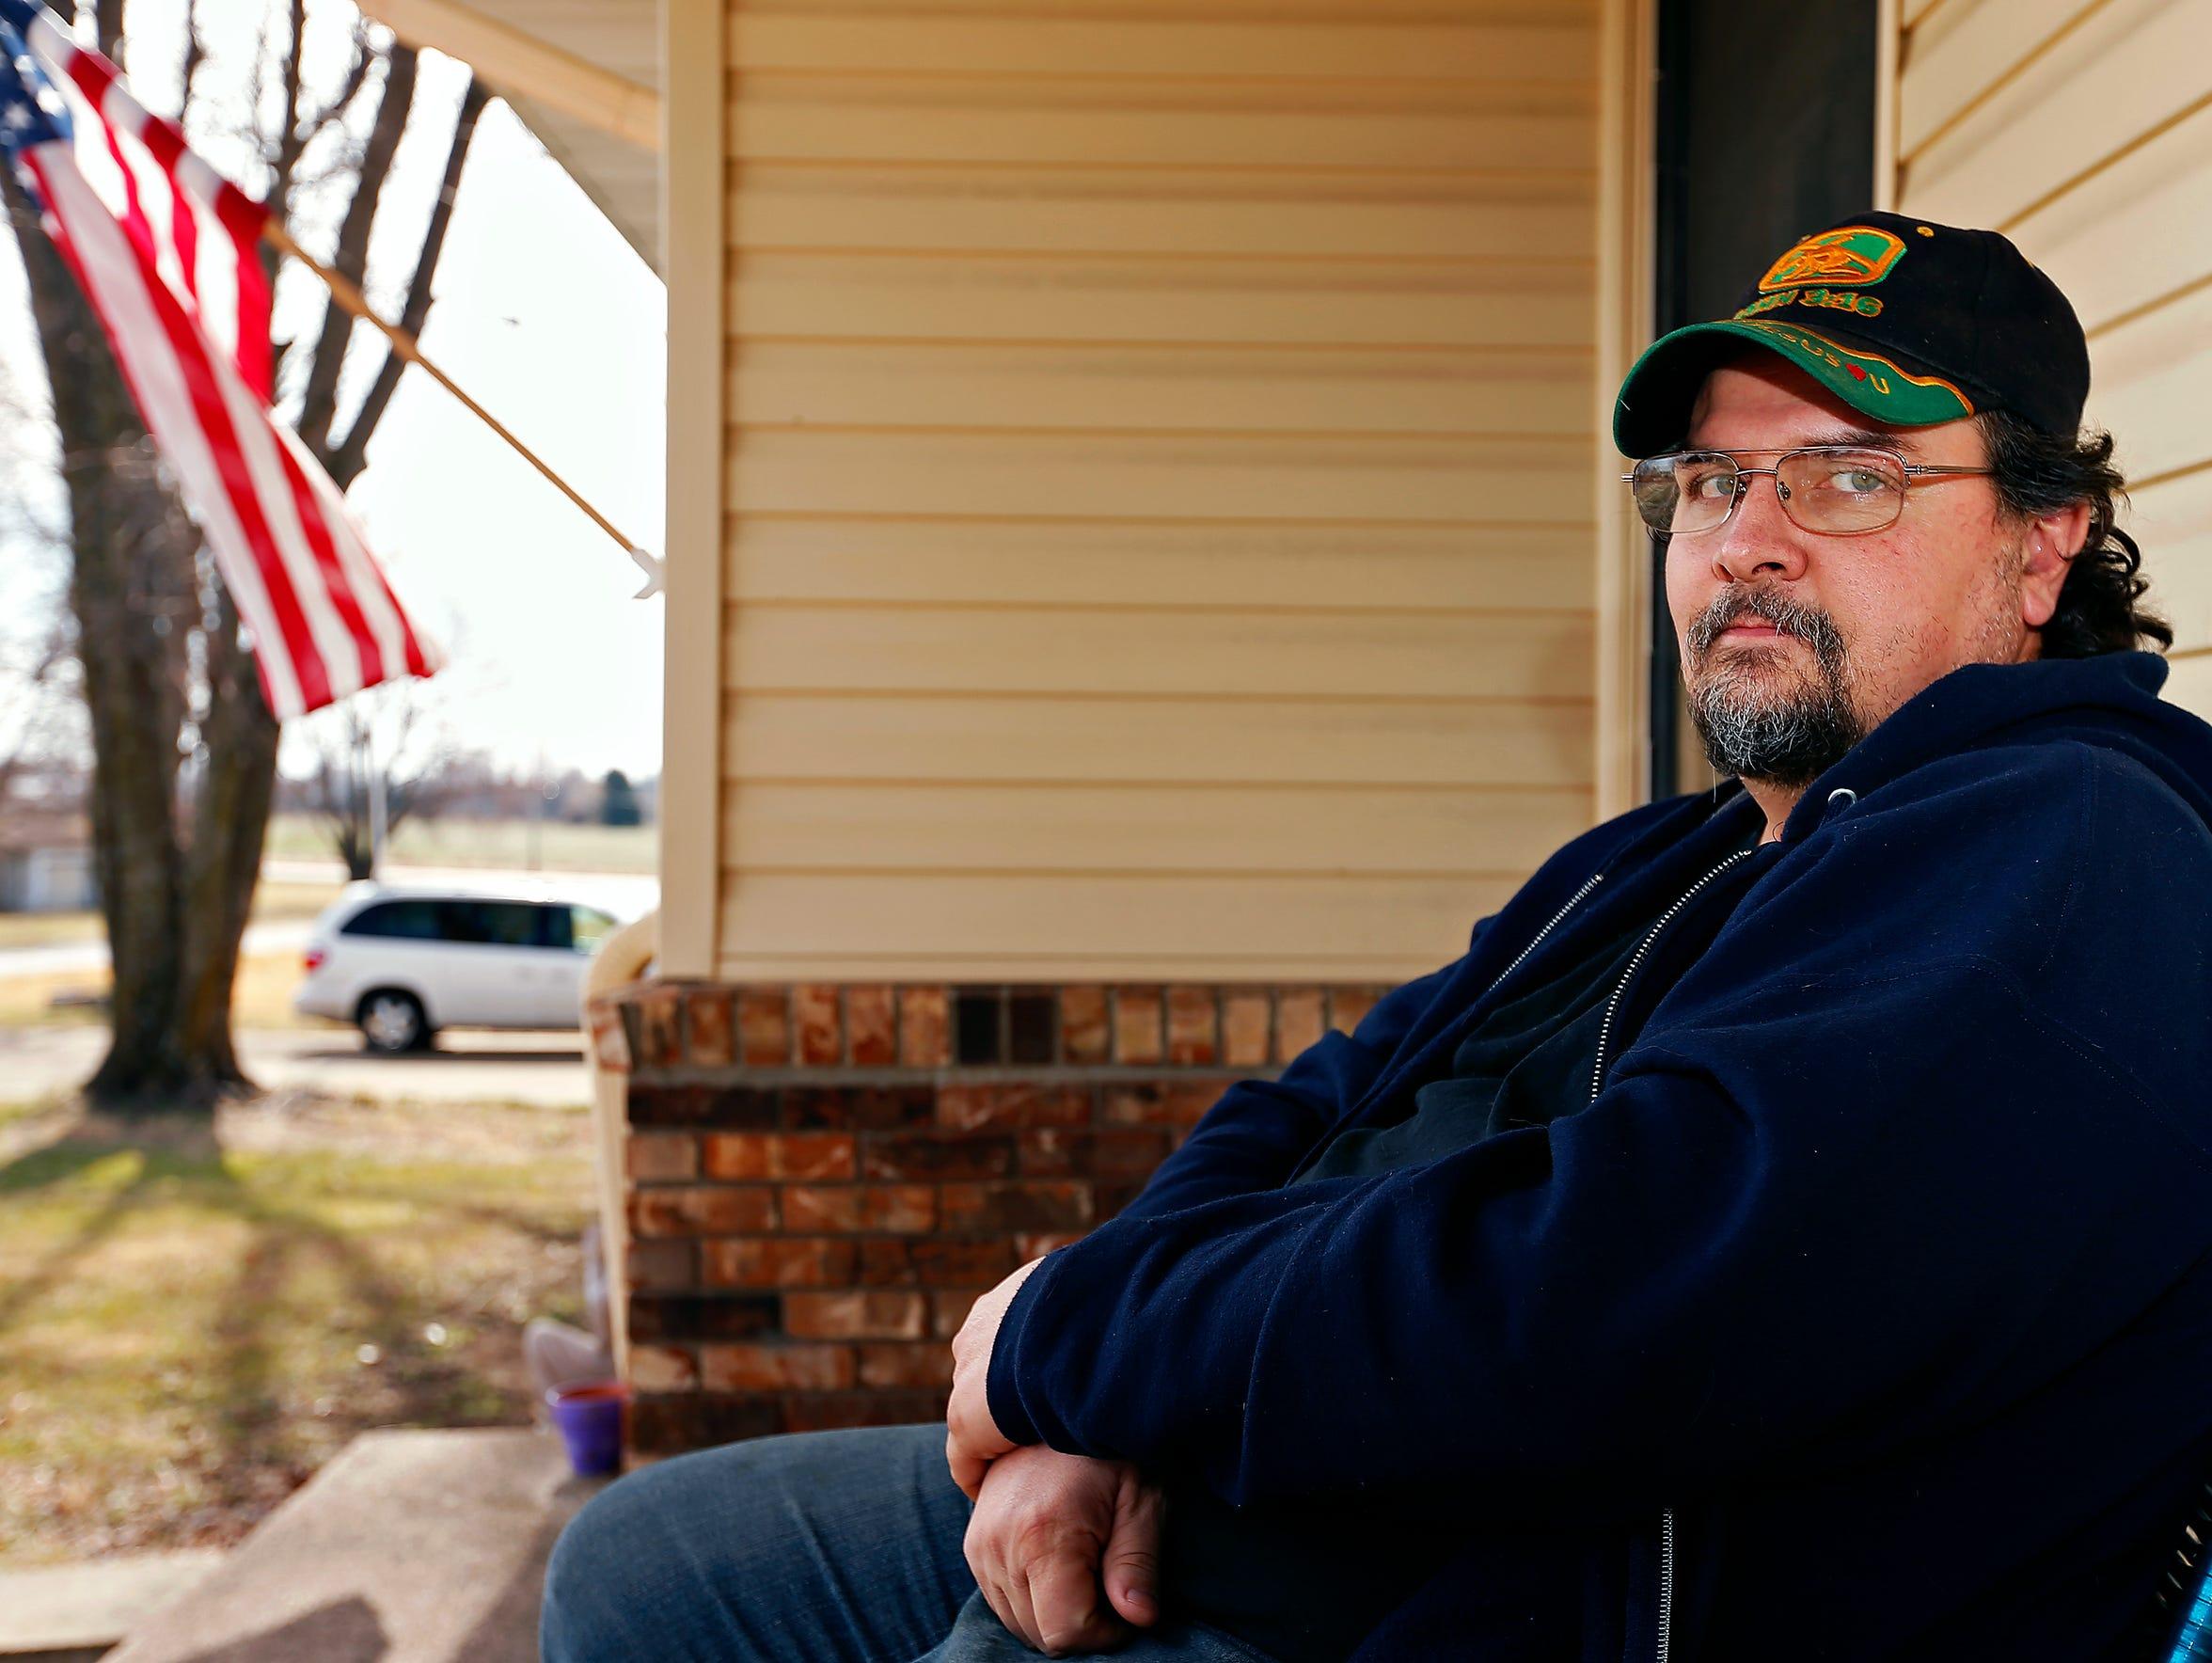 Jeffrey Melhorn lives across the street from the Buffalo,